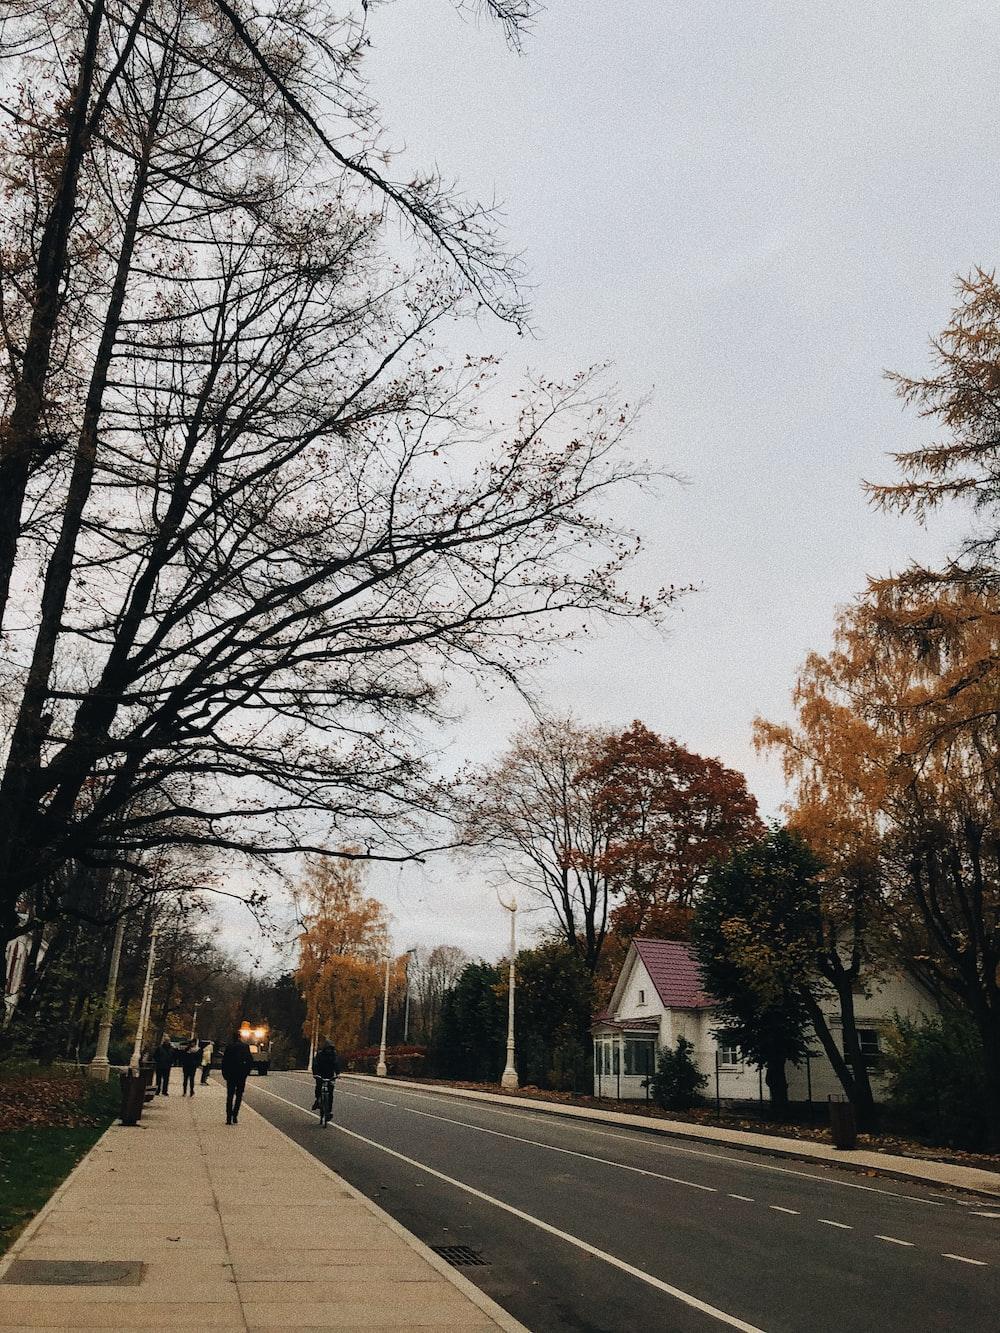 people walking on street sideway near trees during daytime